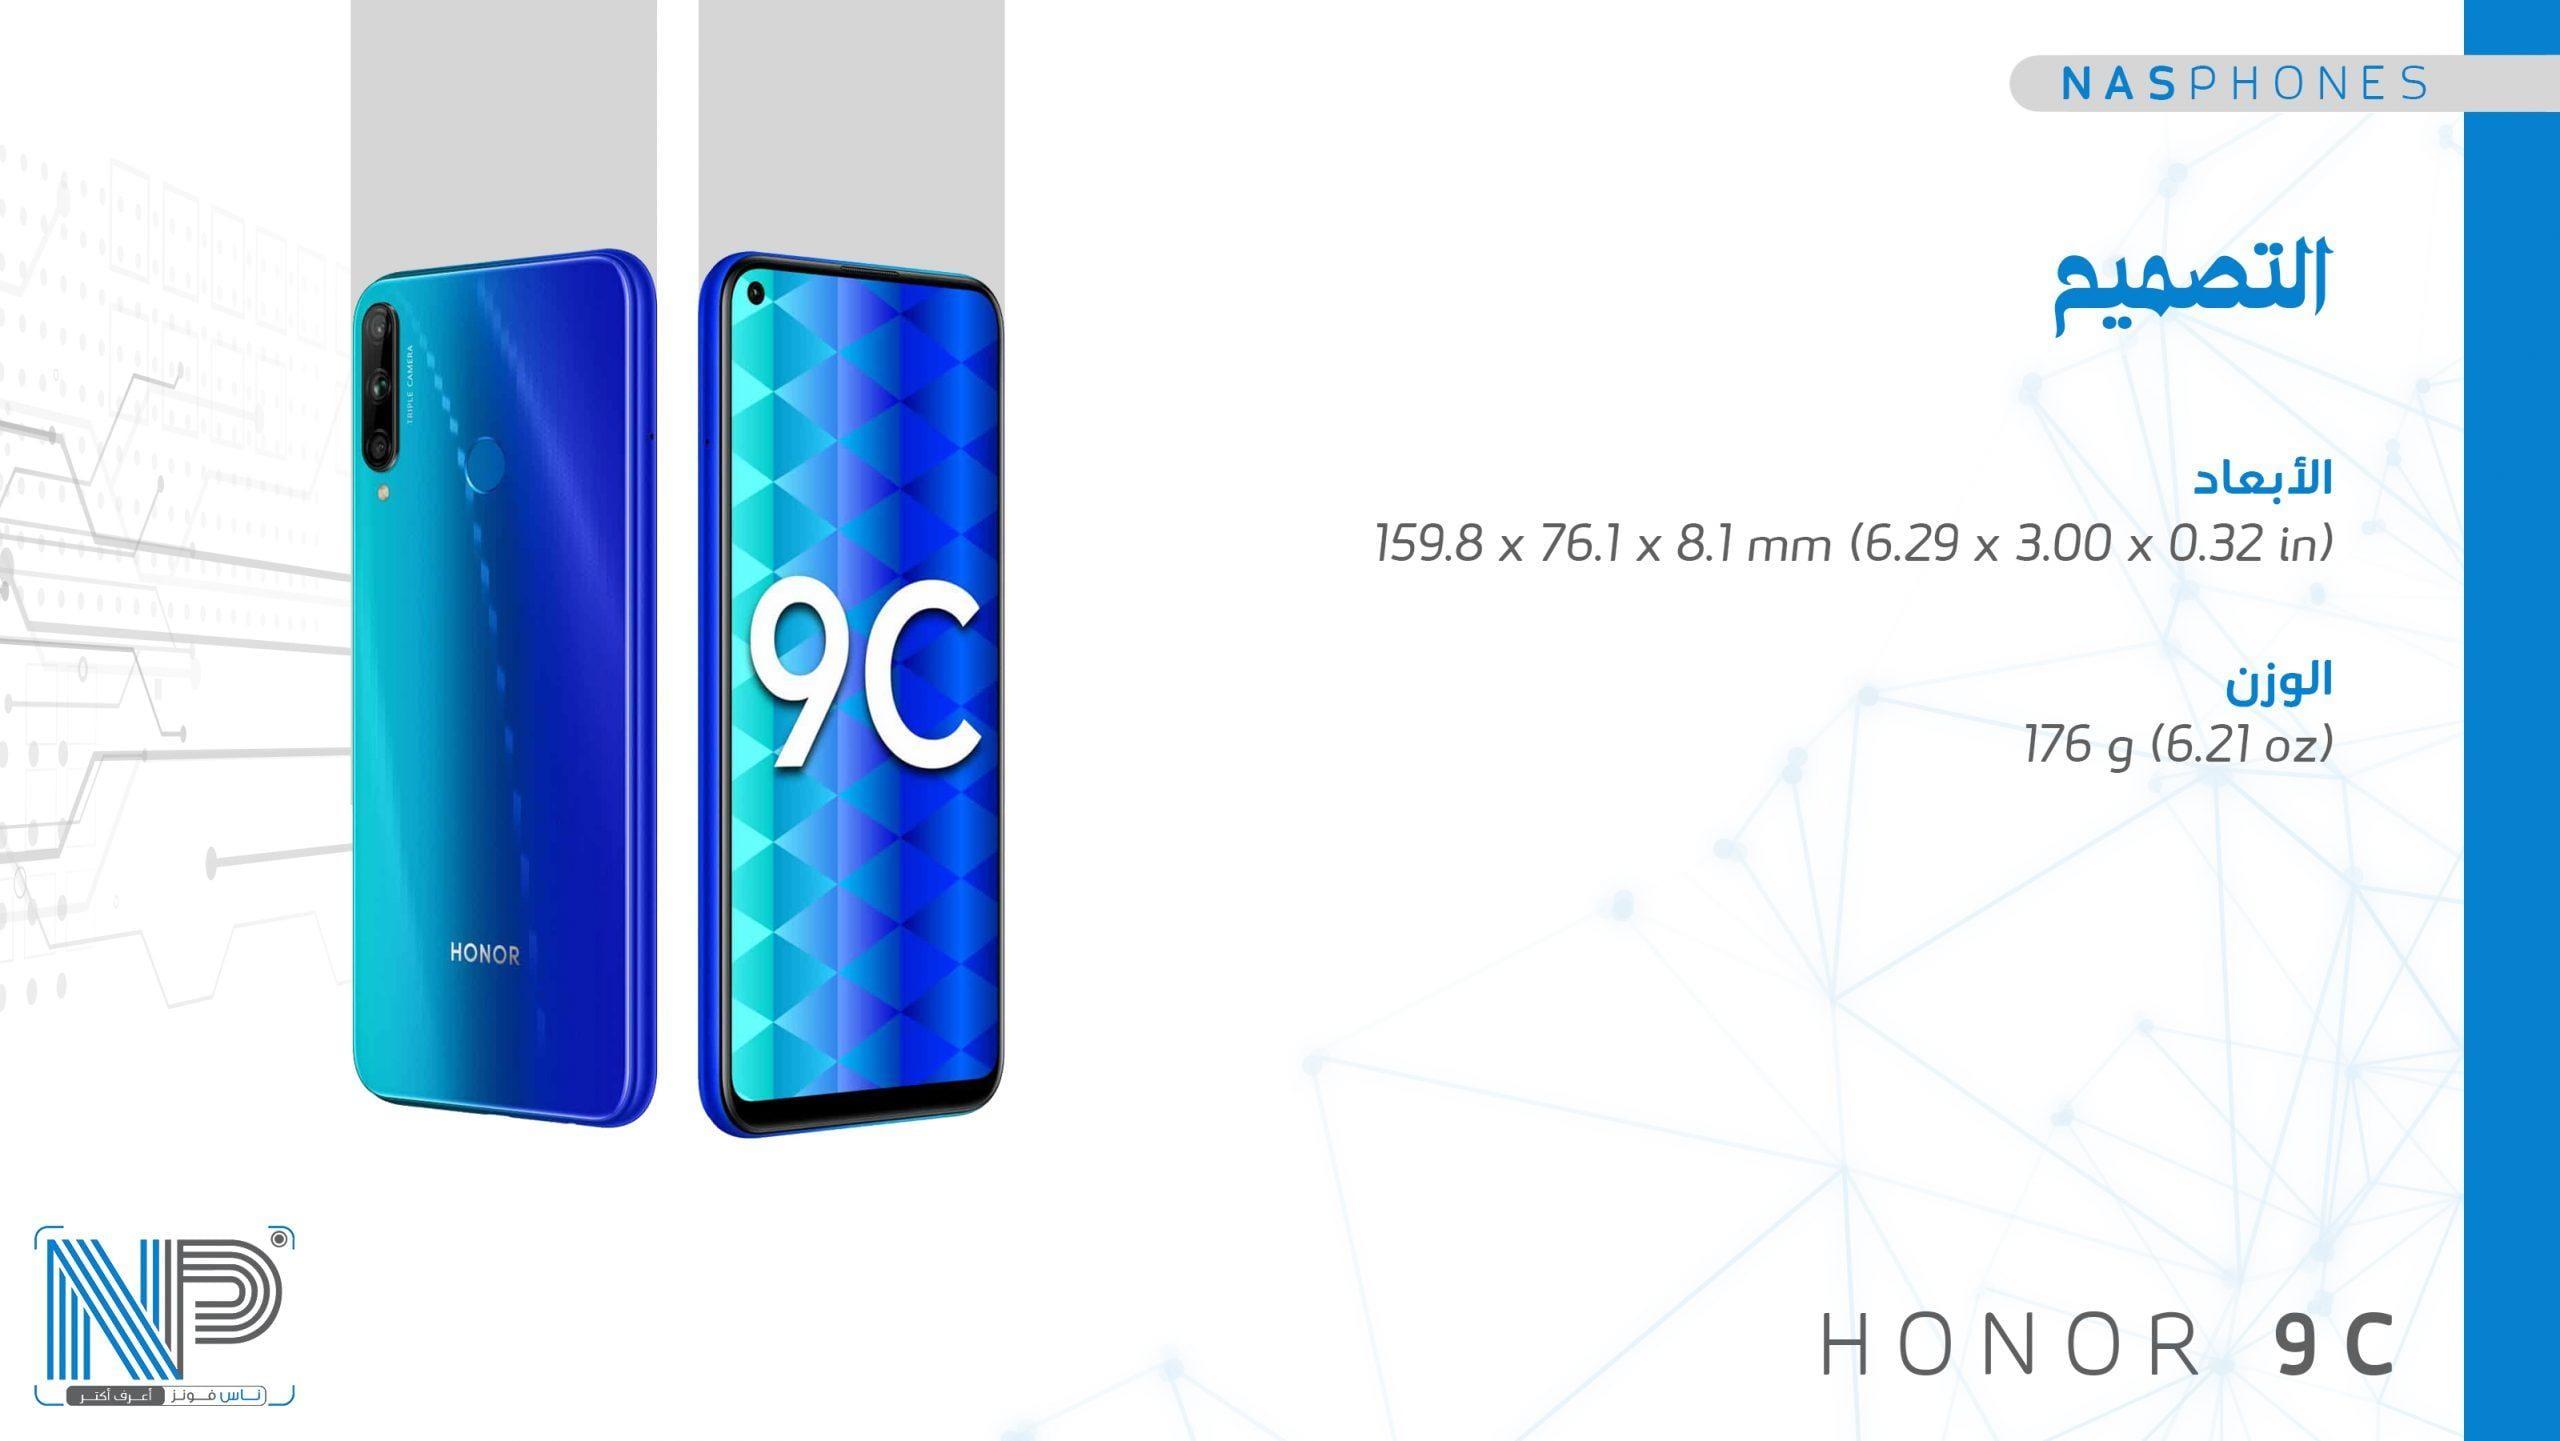 تصميم موبايل Honor 9C